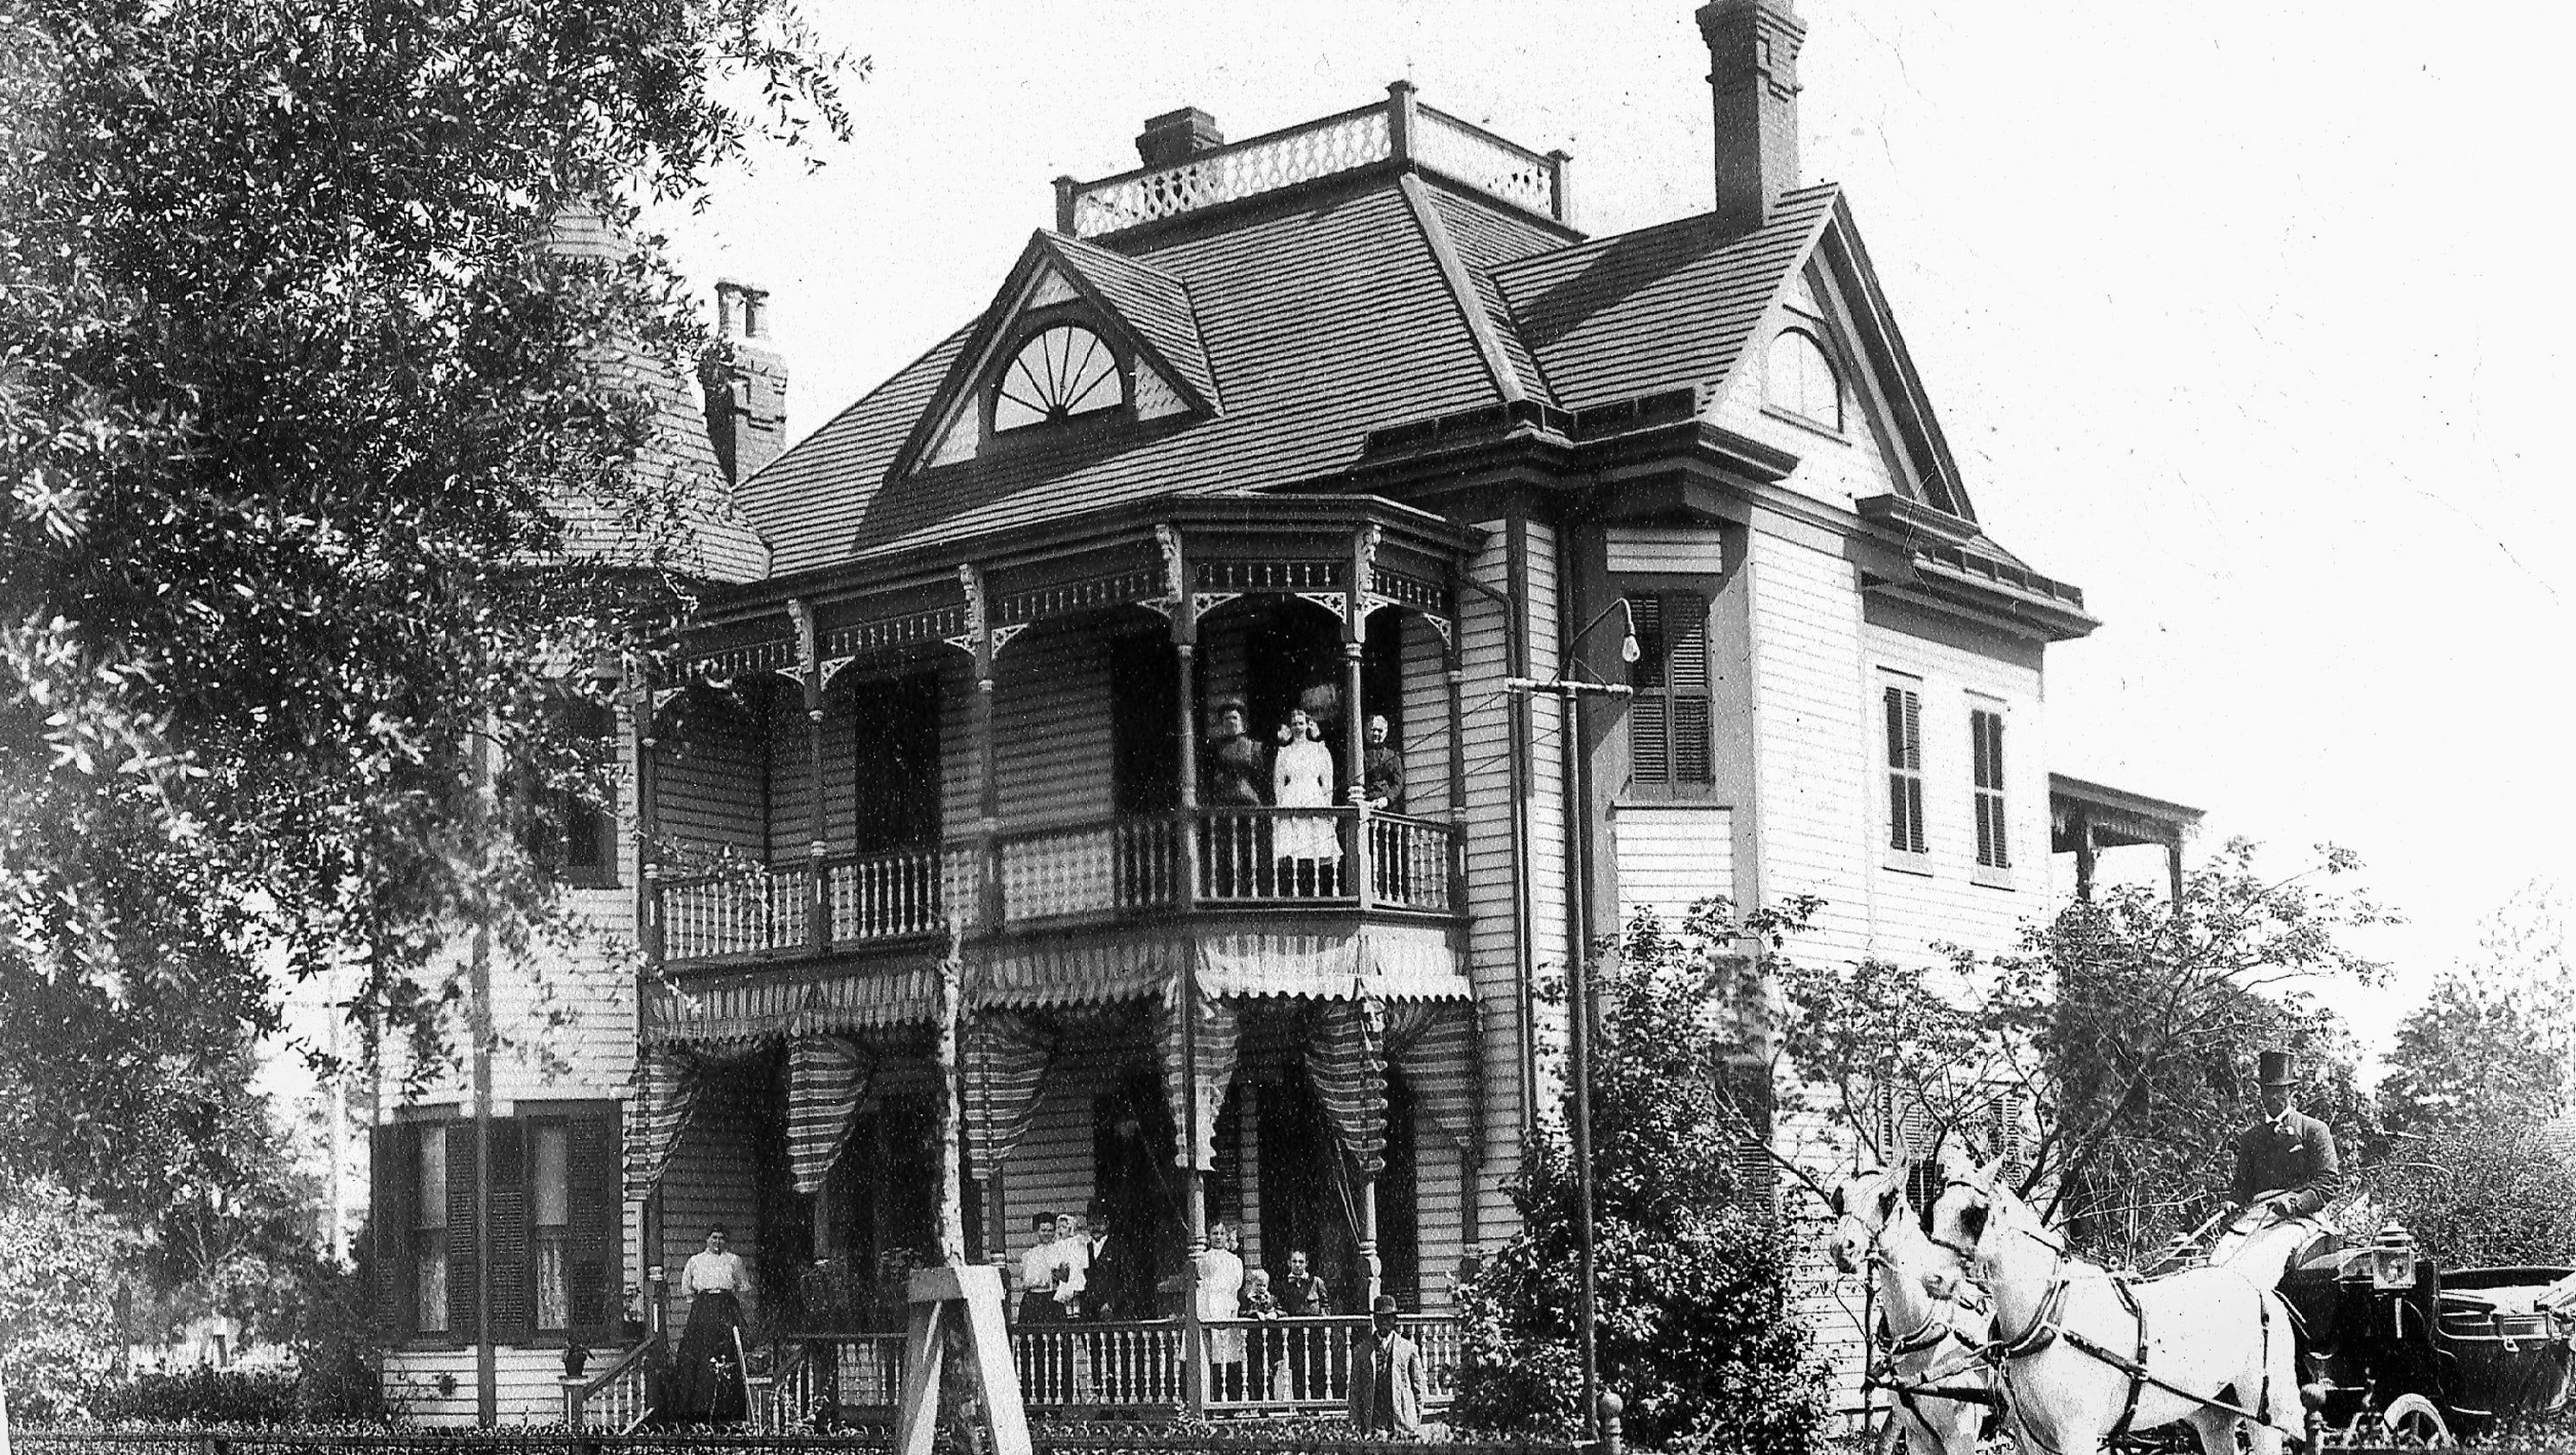 Historic photos pensacola residences for Victorian house facts